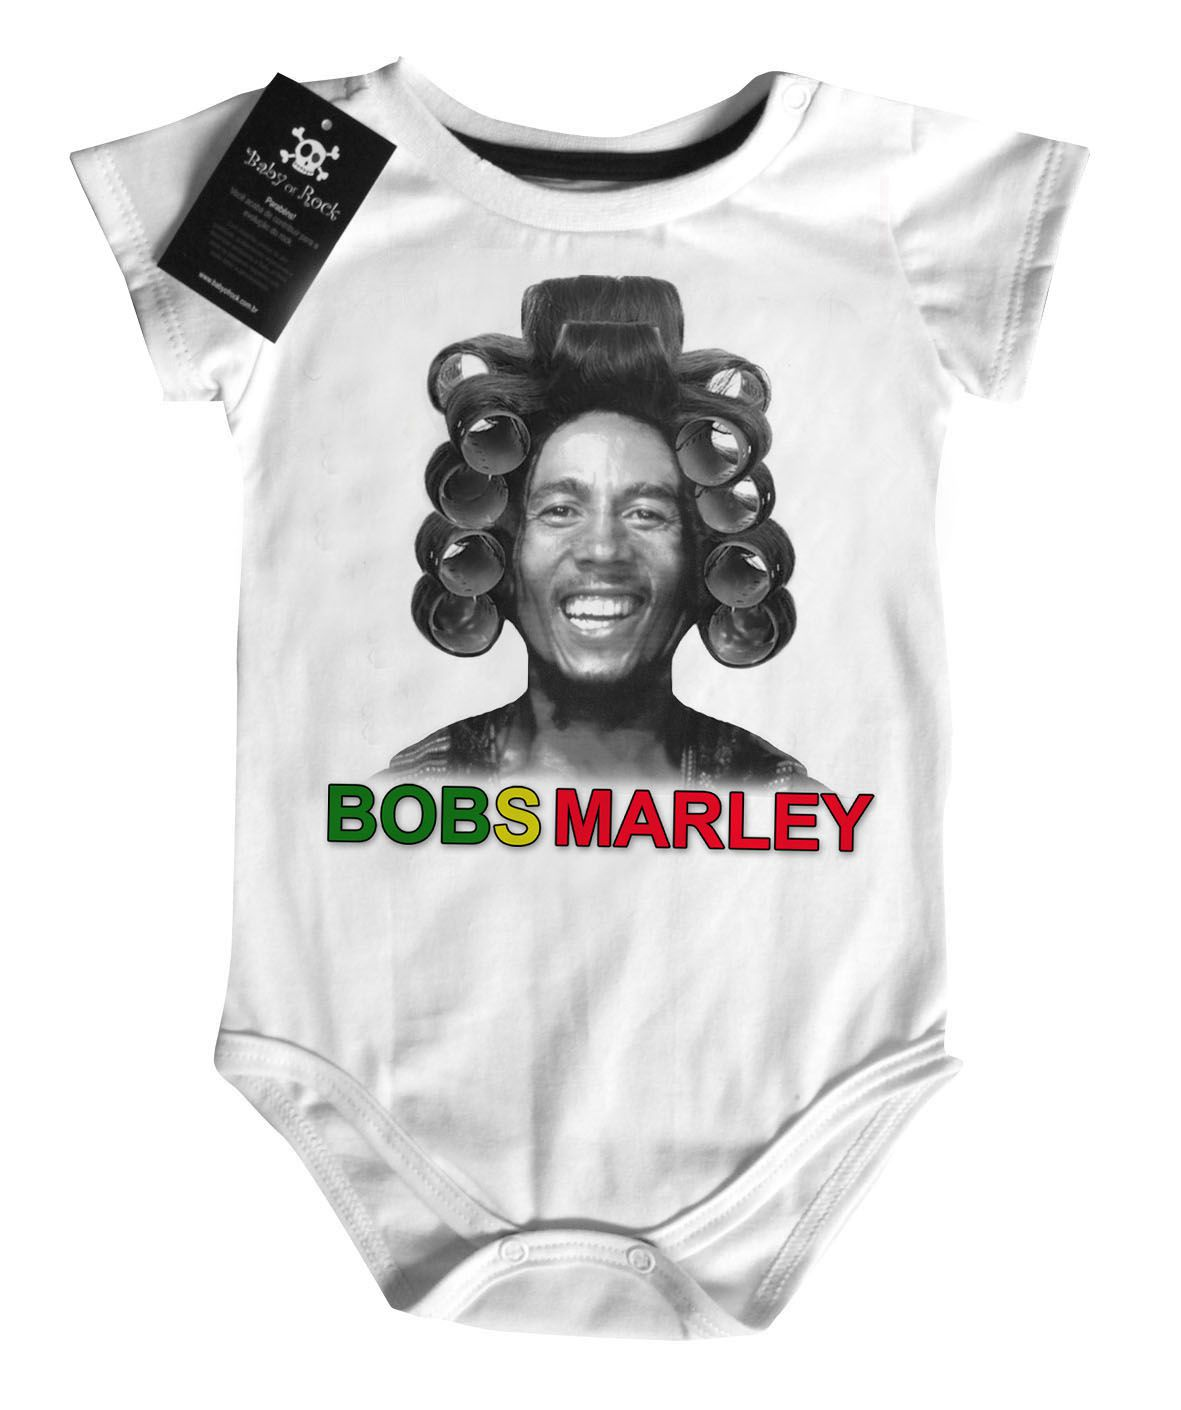 Body Bebê | Bobs Marley | white  - Baby Monster S/A